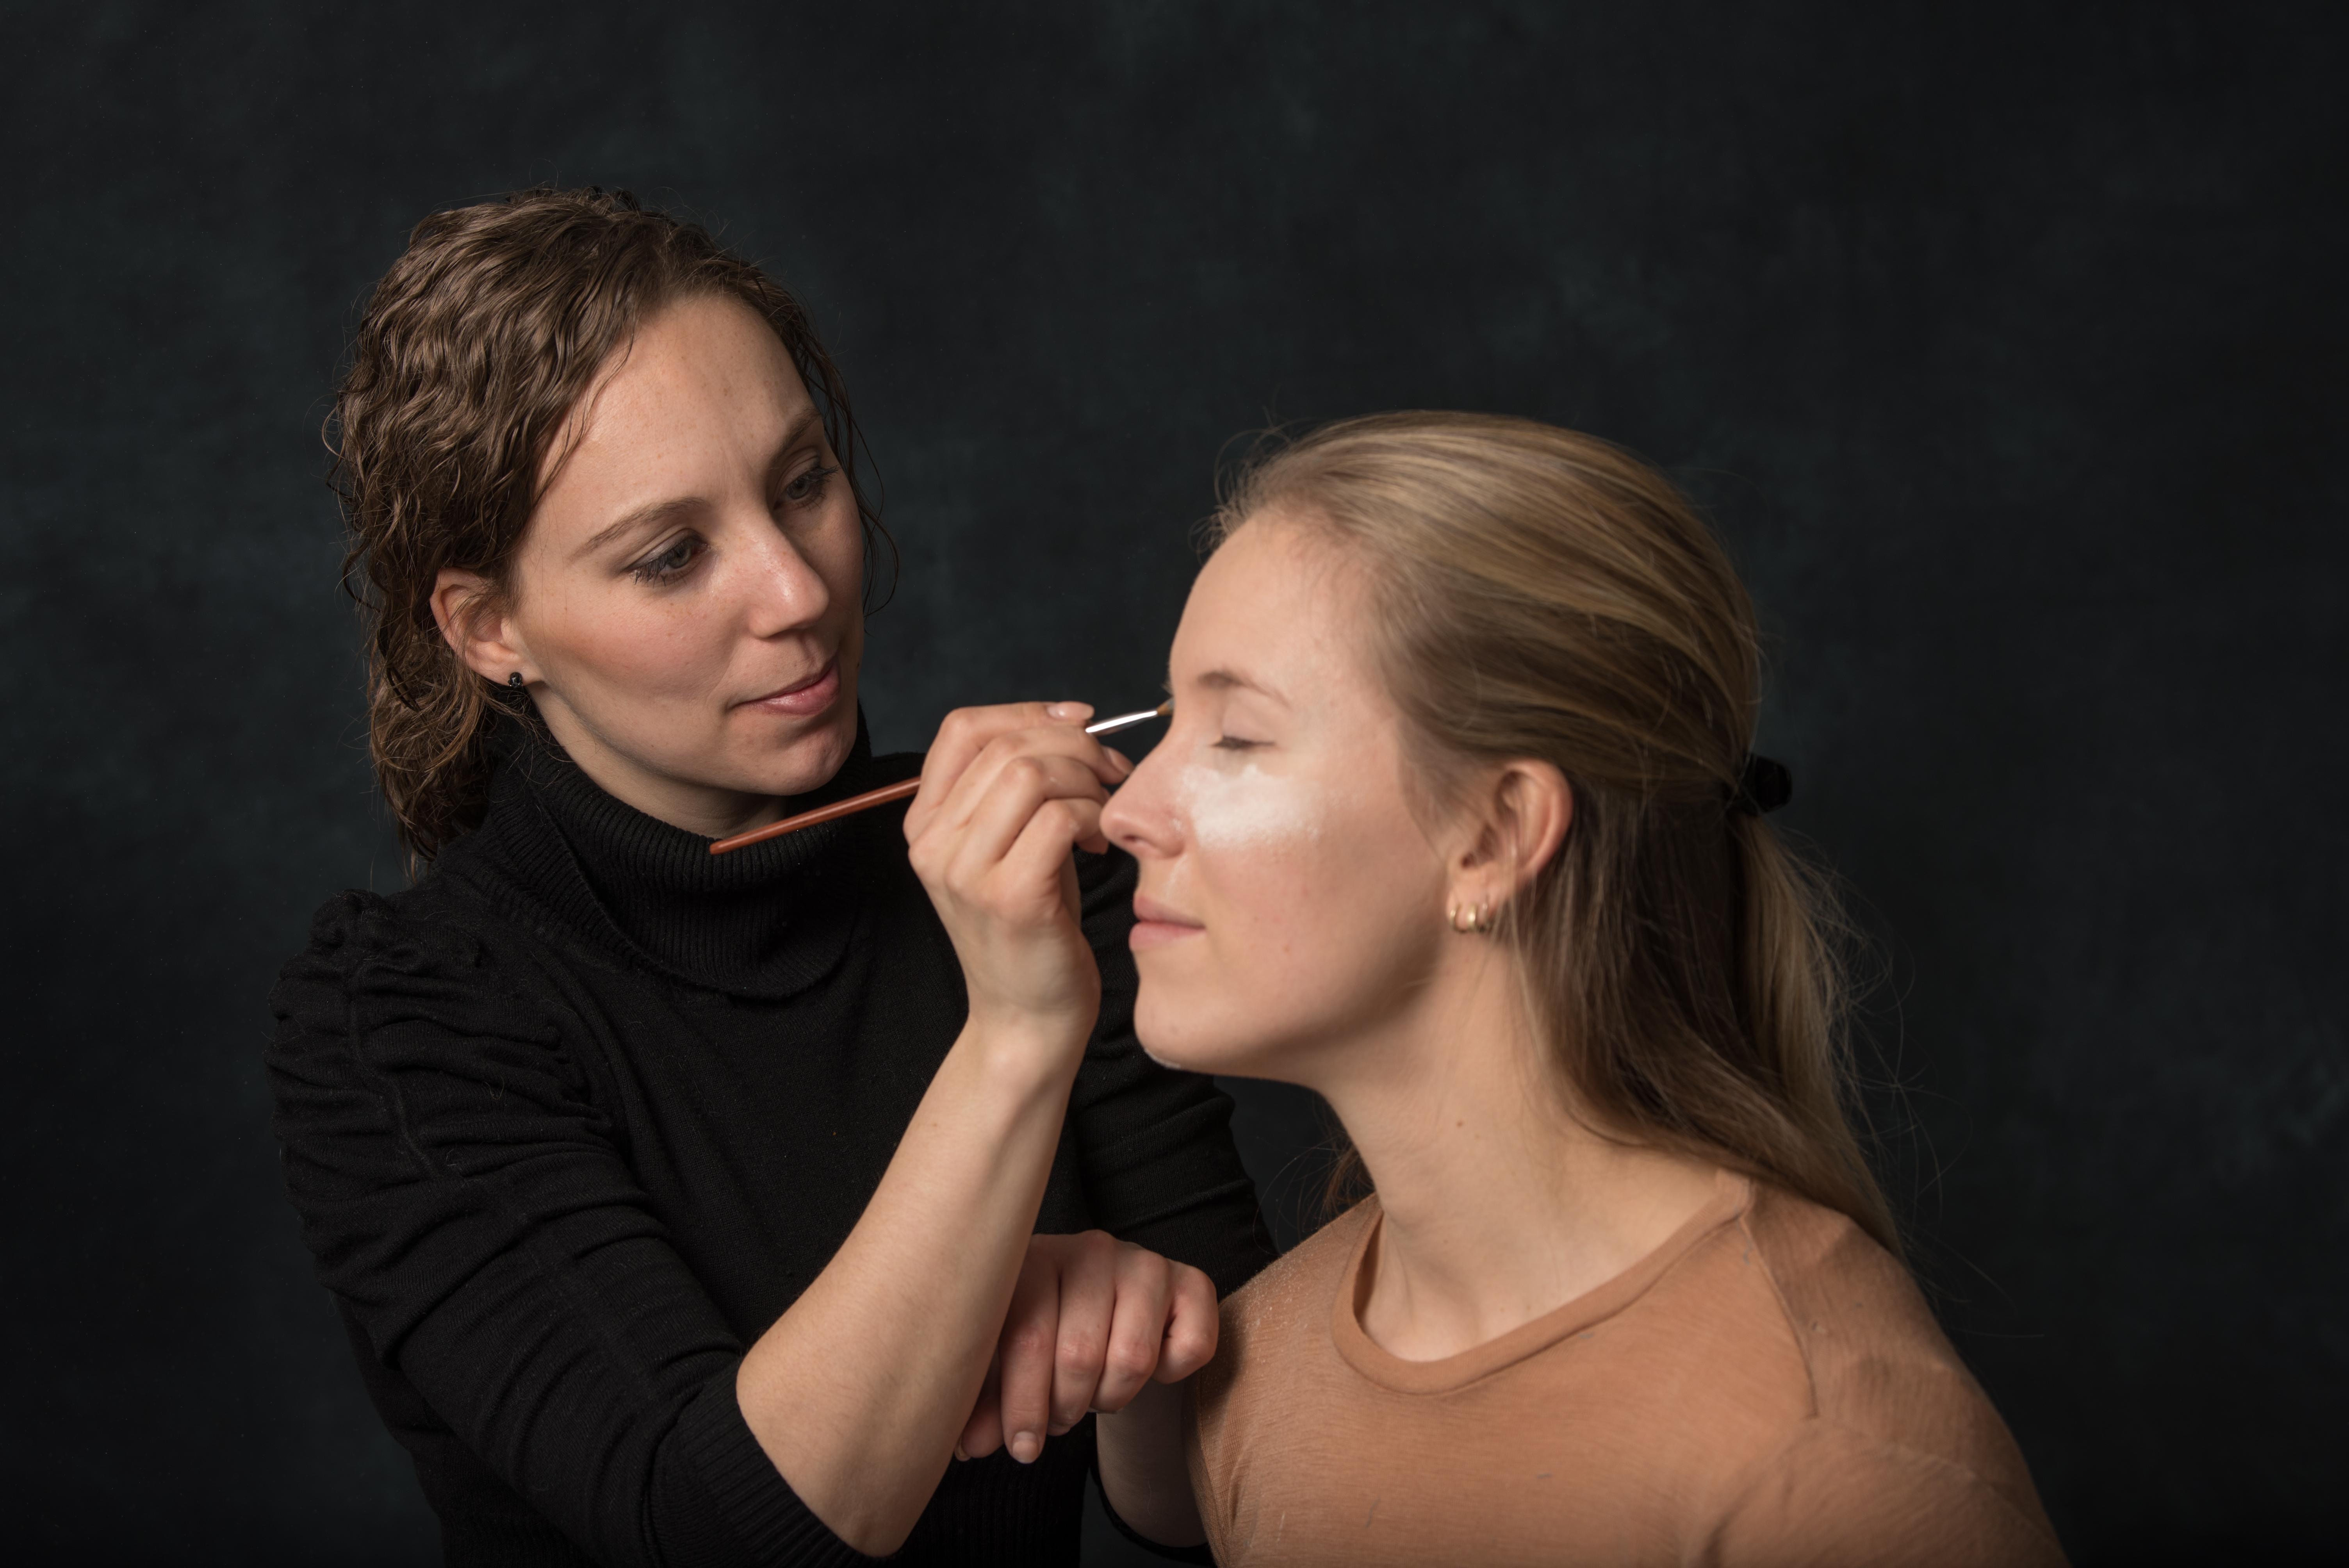 Extreme make-up